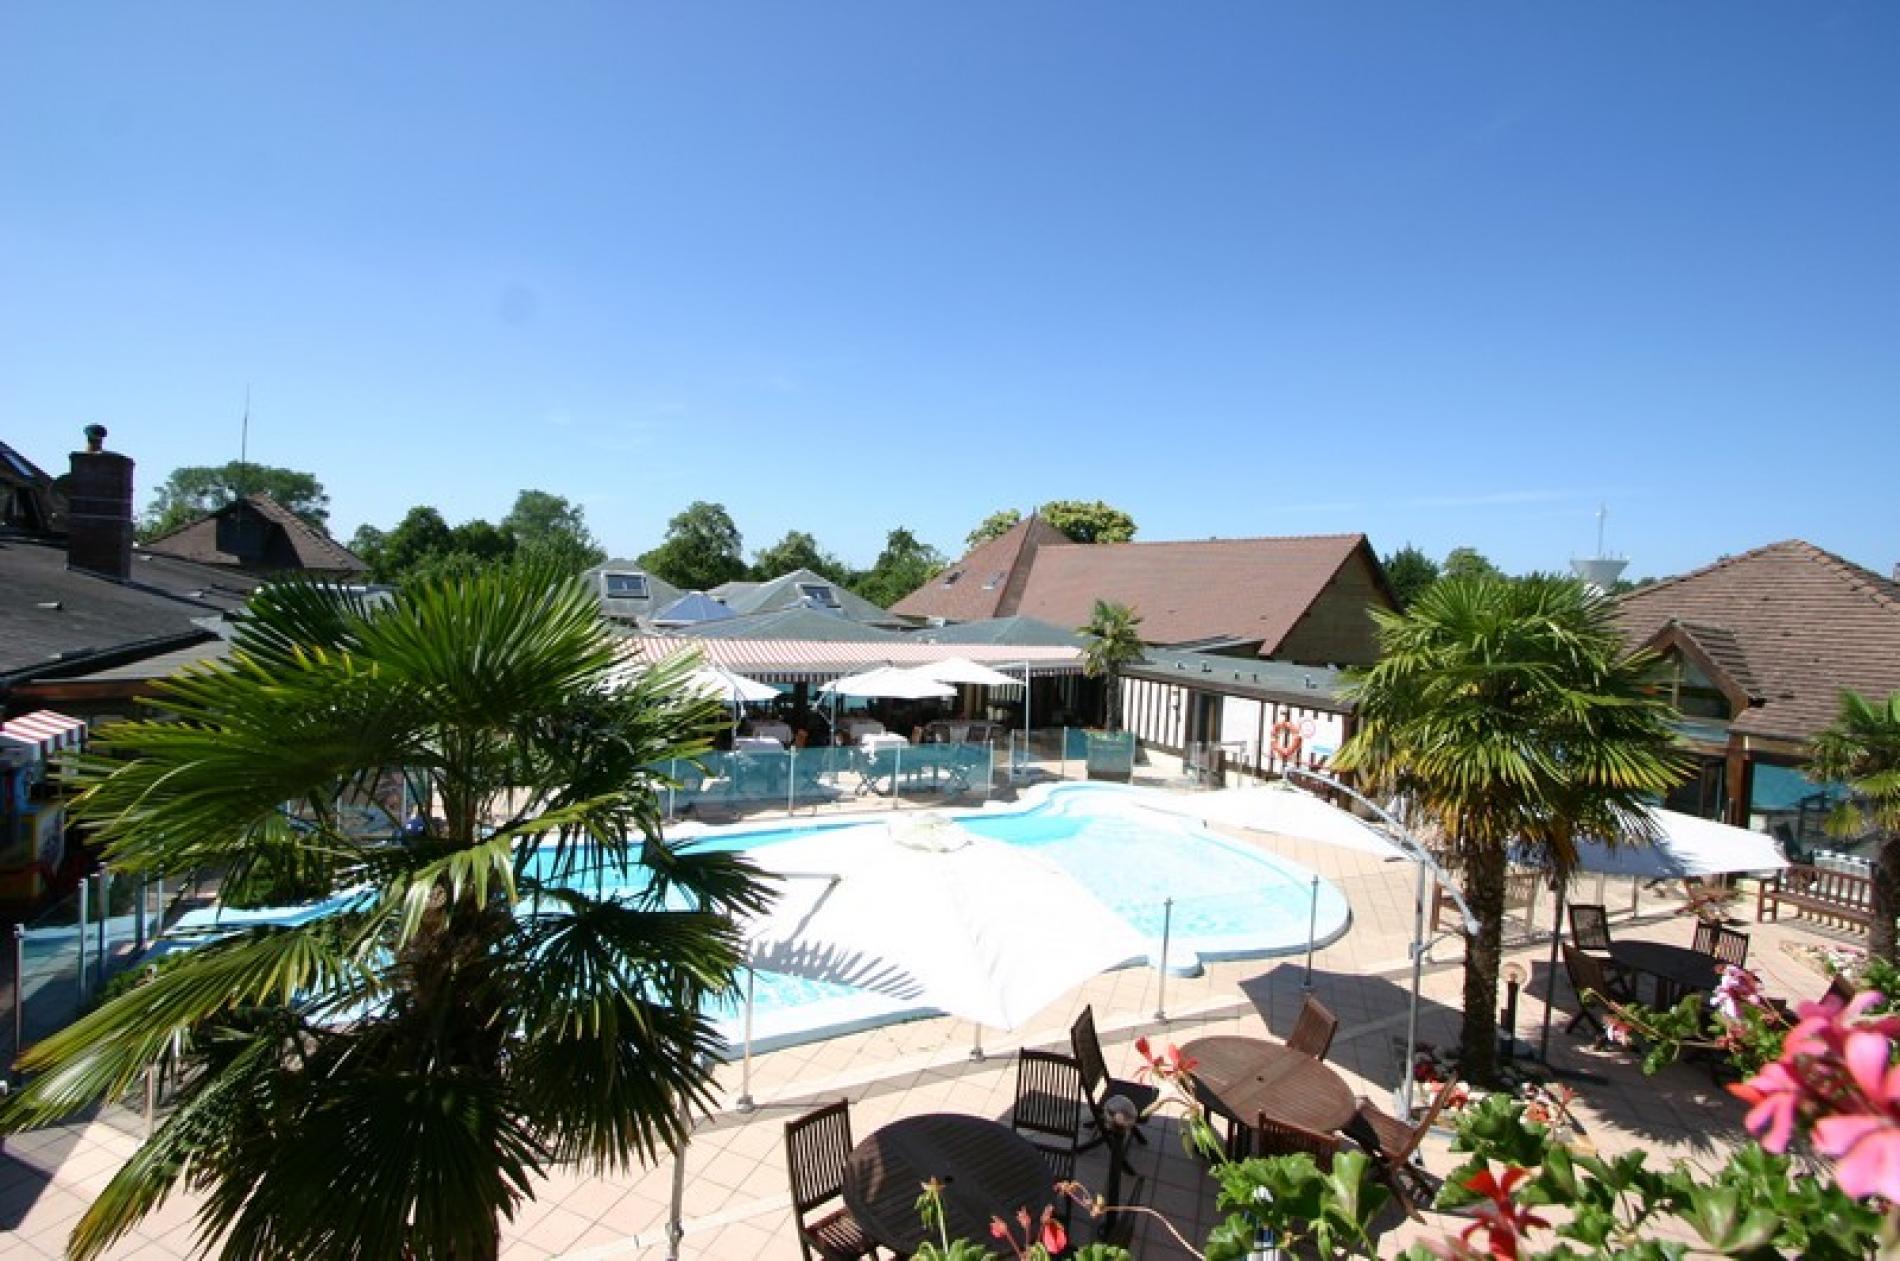 Hotel deauville avec piscine hotel 3 toiles deauville for Piscine spa deauville